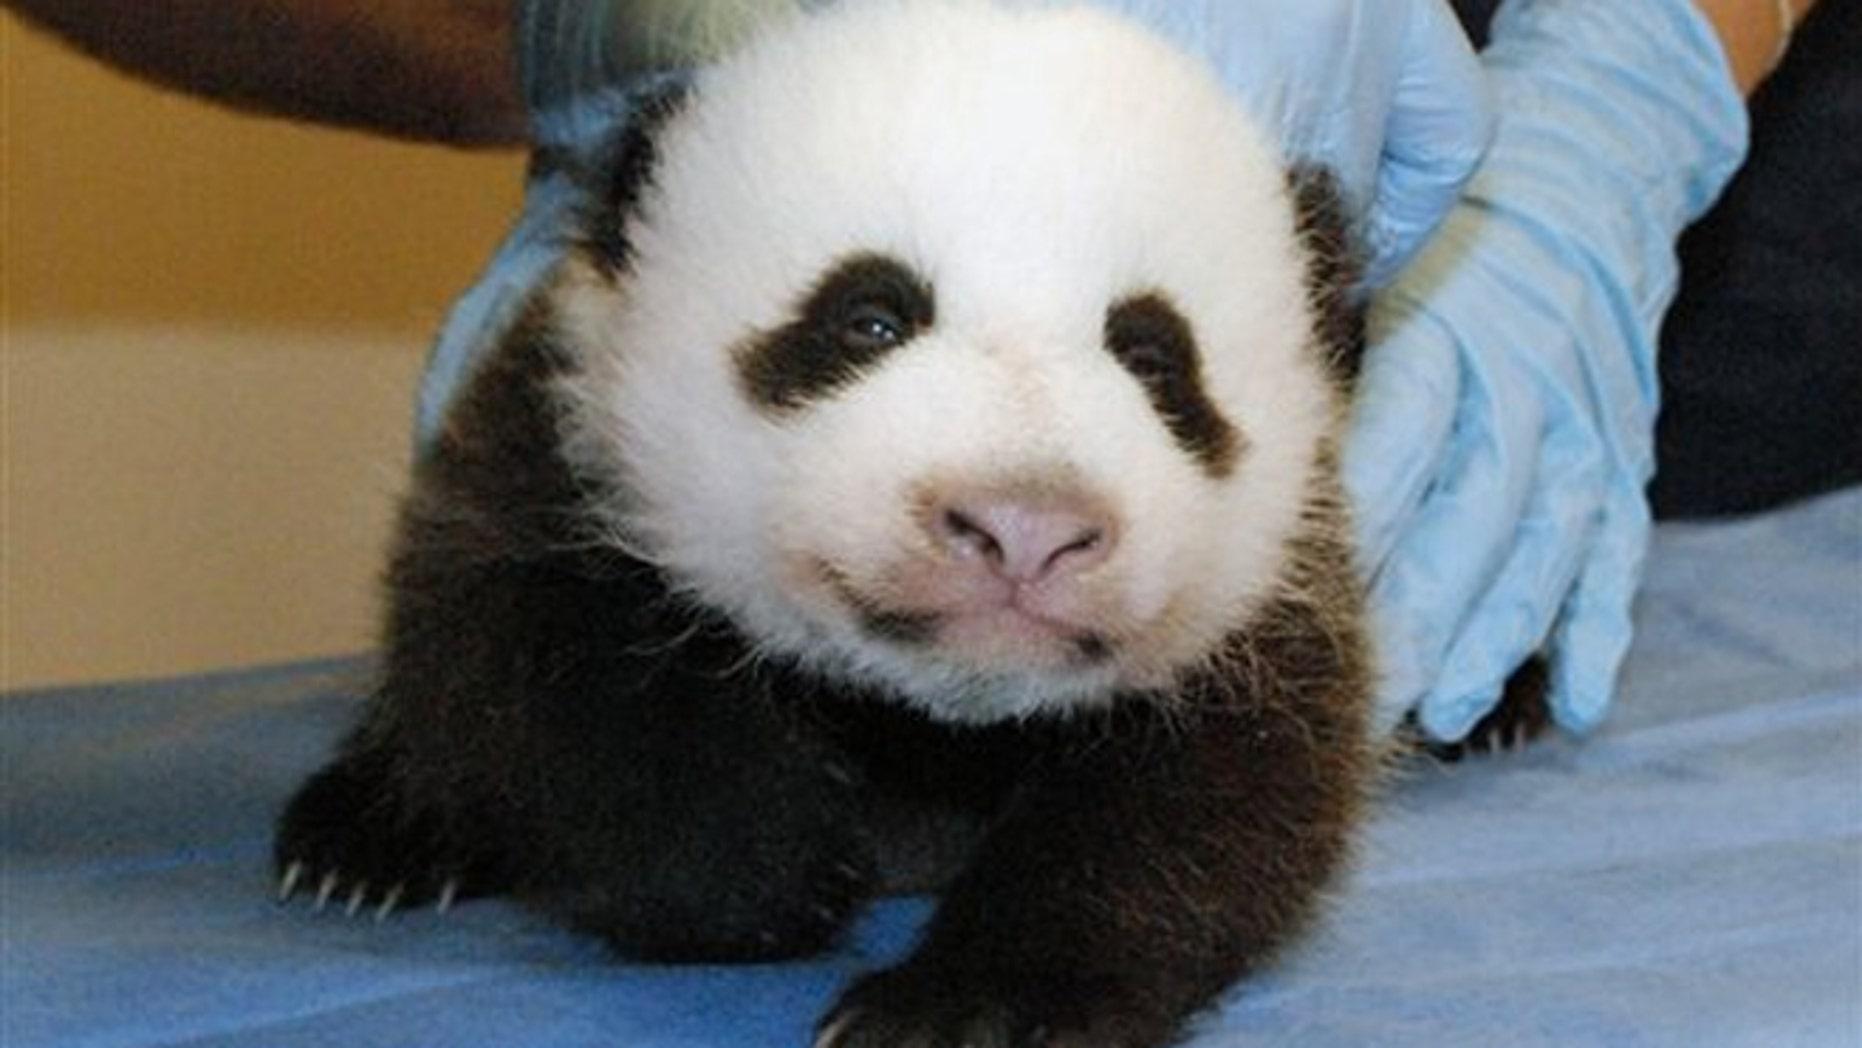 FILE: Mei Xiang's giant panda cub undergoing an exam on Oct. 11, 2013, at the zoo in Washington.